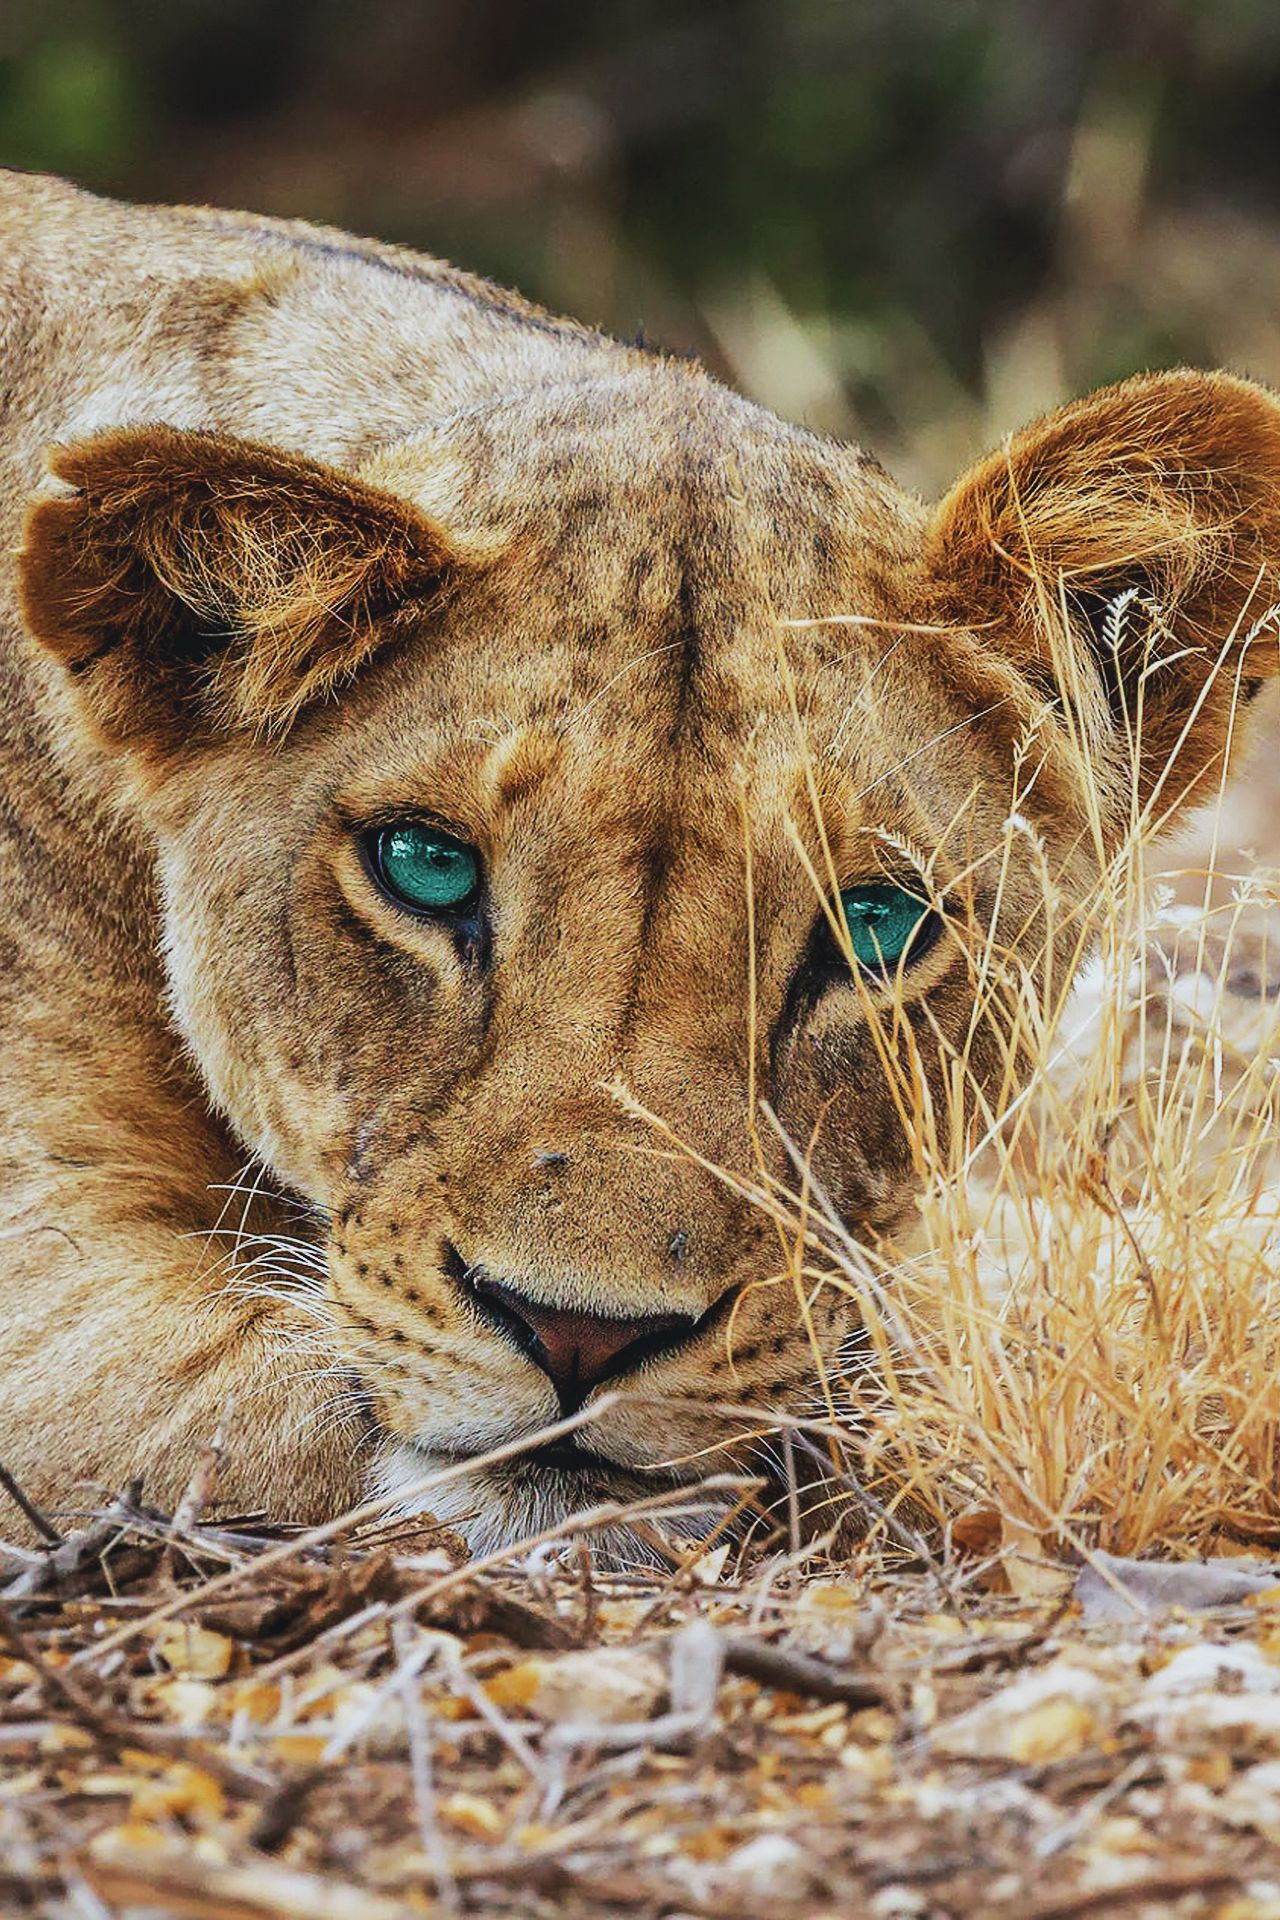 Pin Von Anaclaragomez Auf Fondos Tiere Raubkatzen Katzen